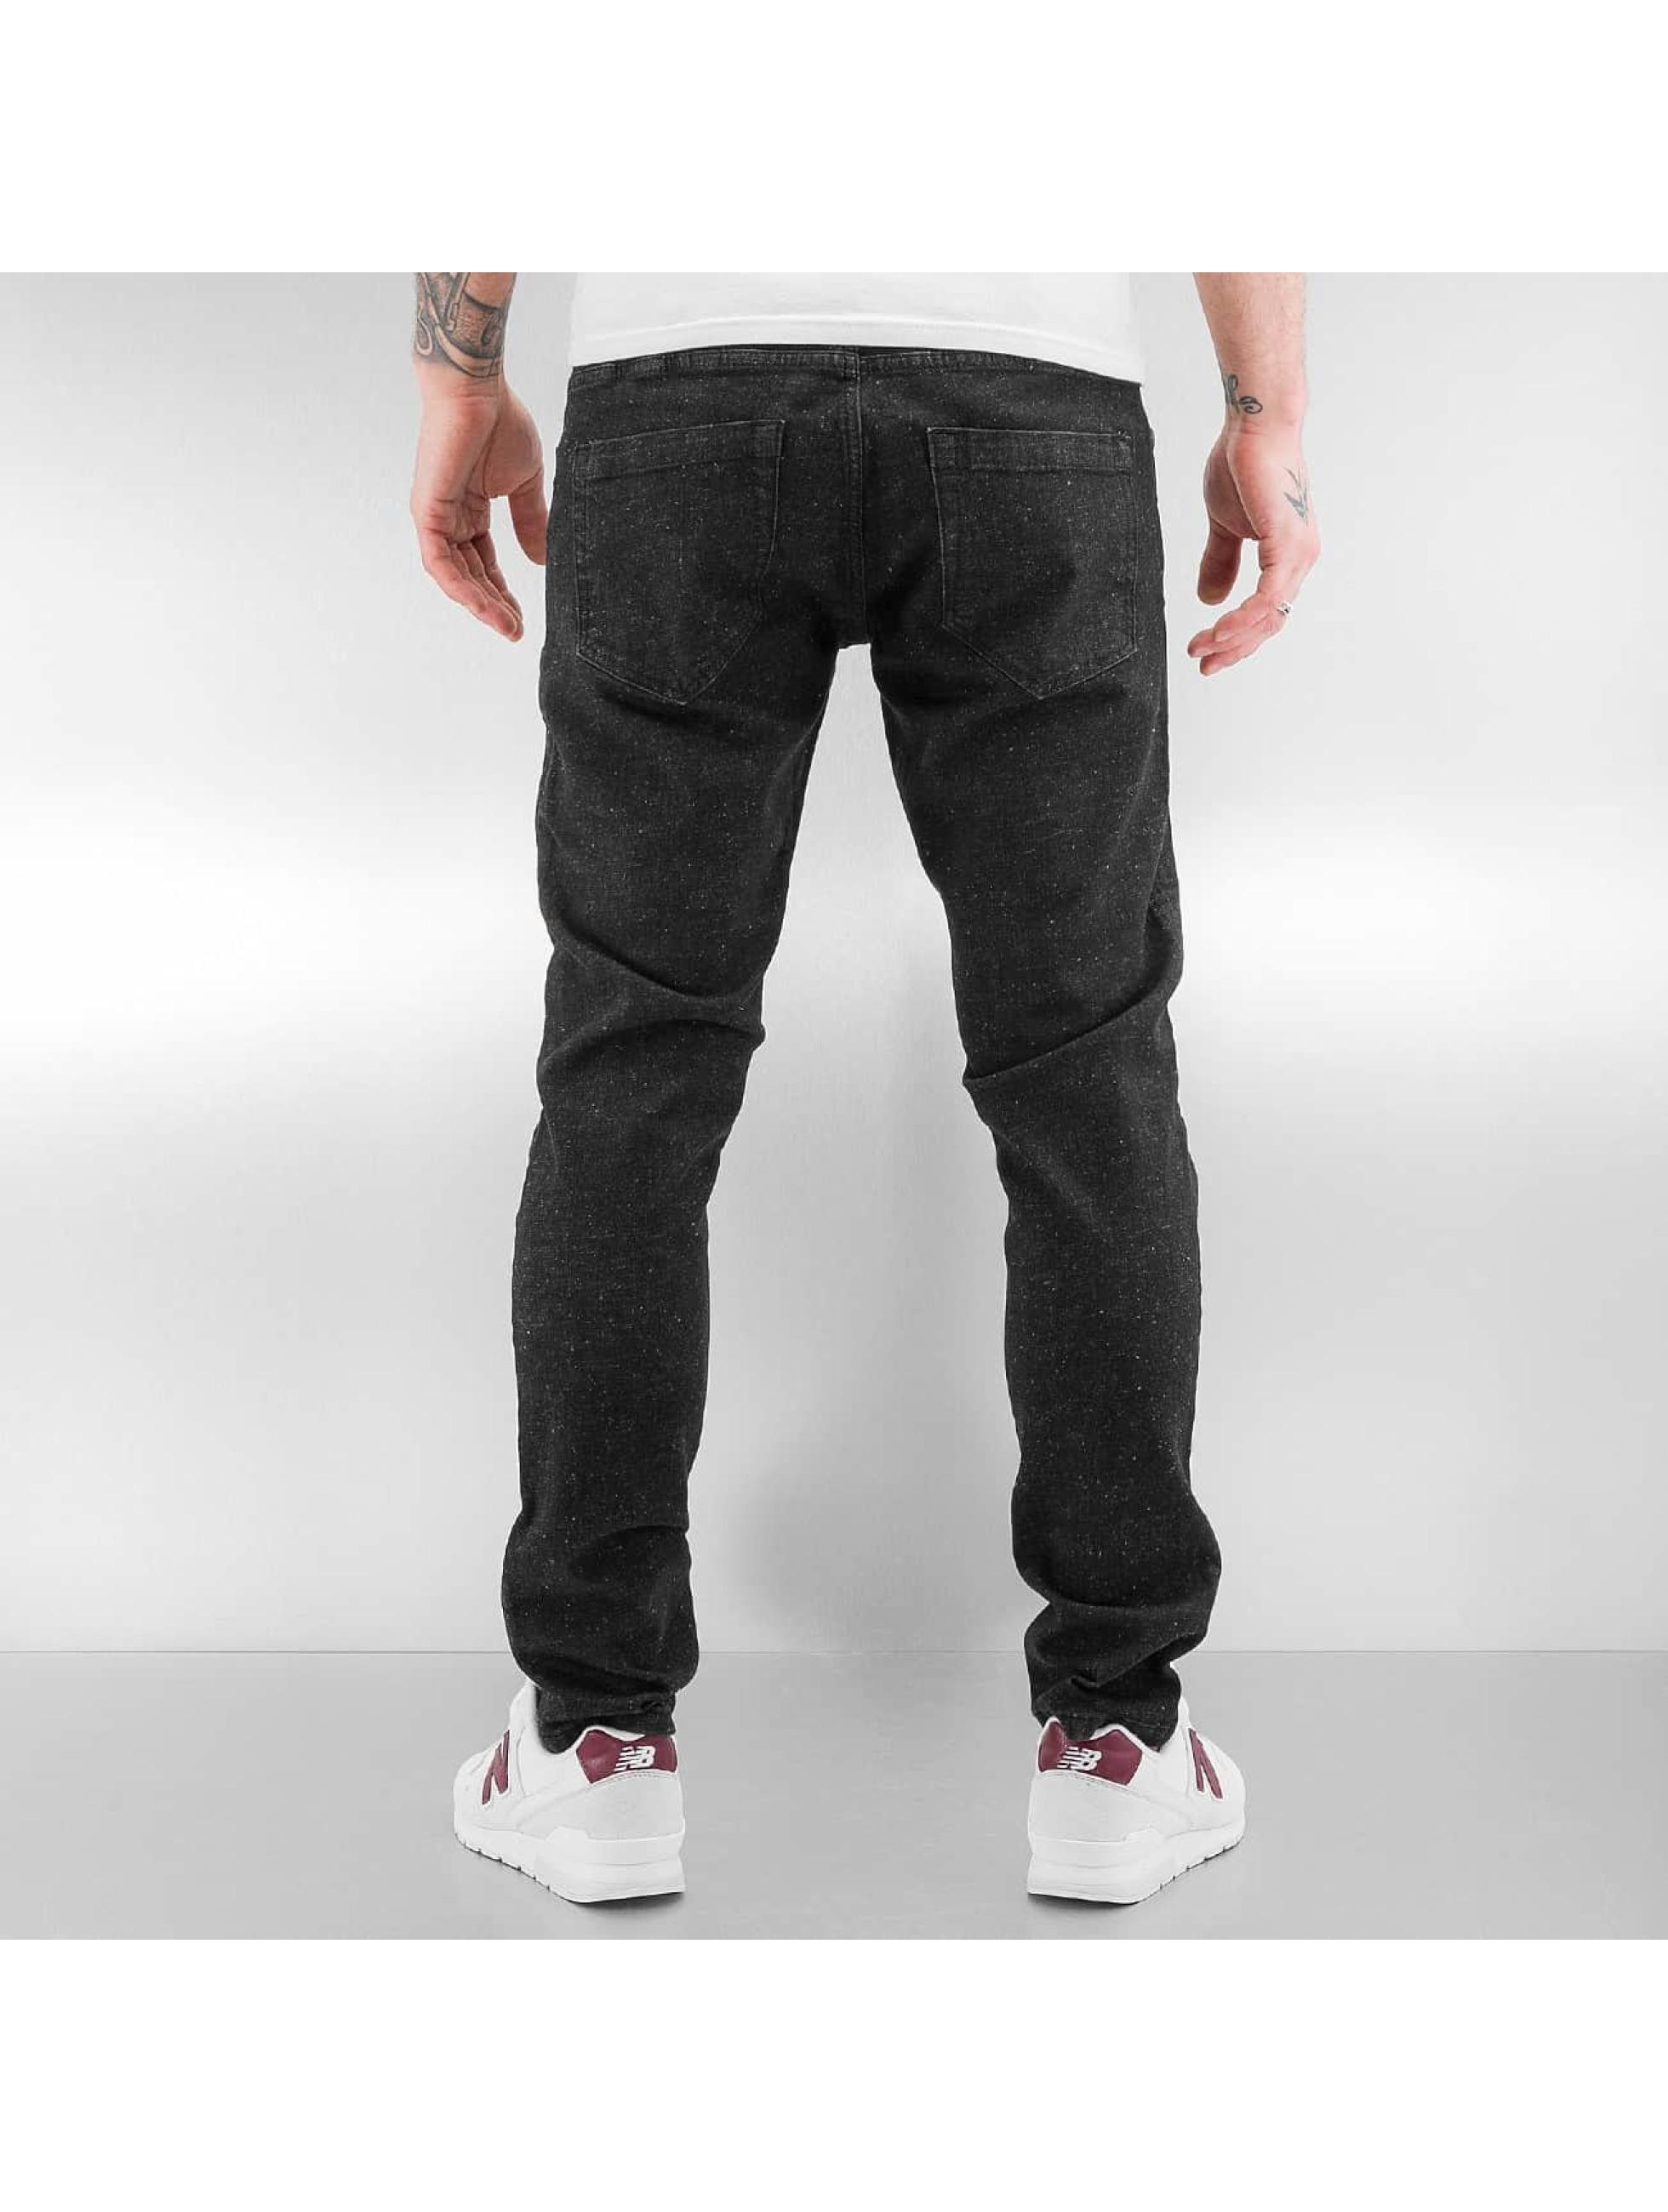 Cyprime Slim Fit Jeans K100 grey